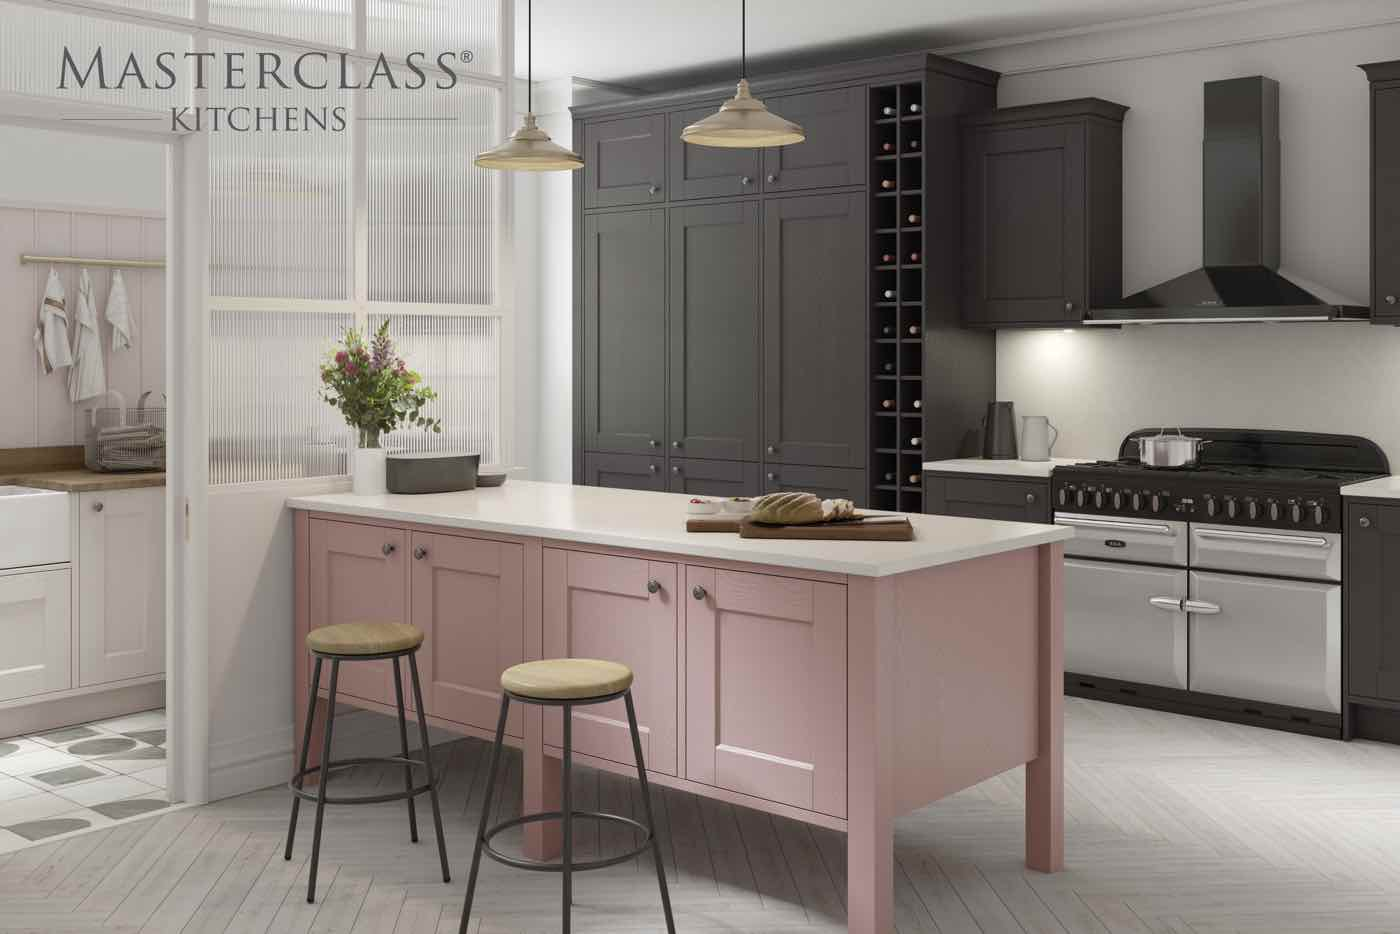 masterclass kitchens edinburgh